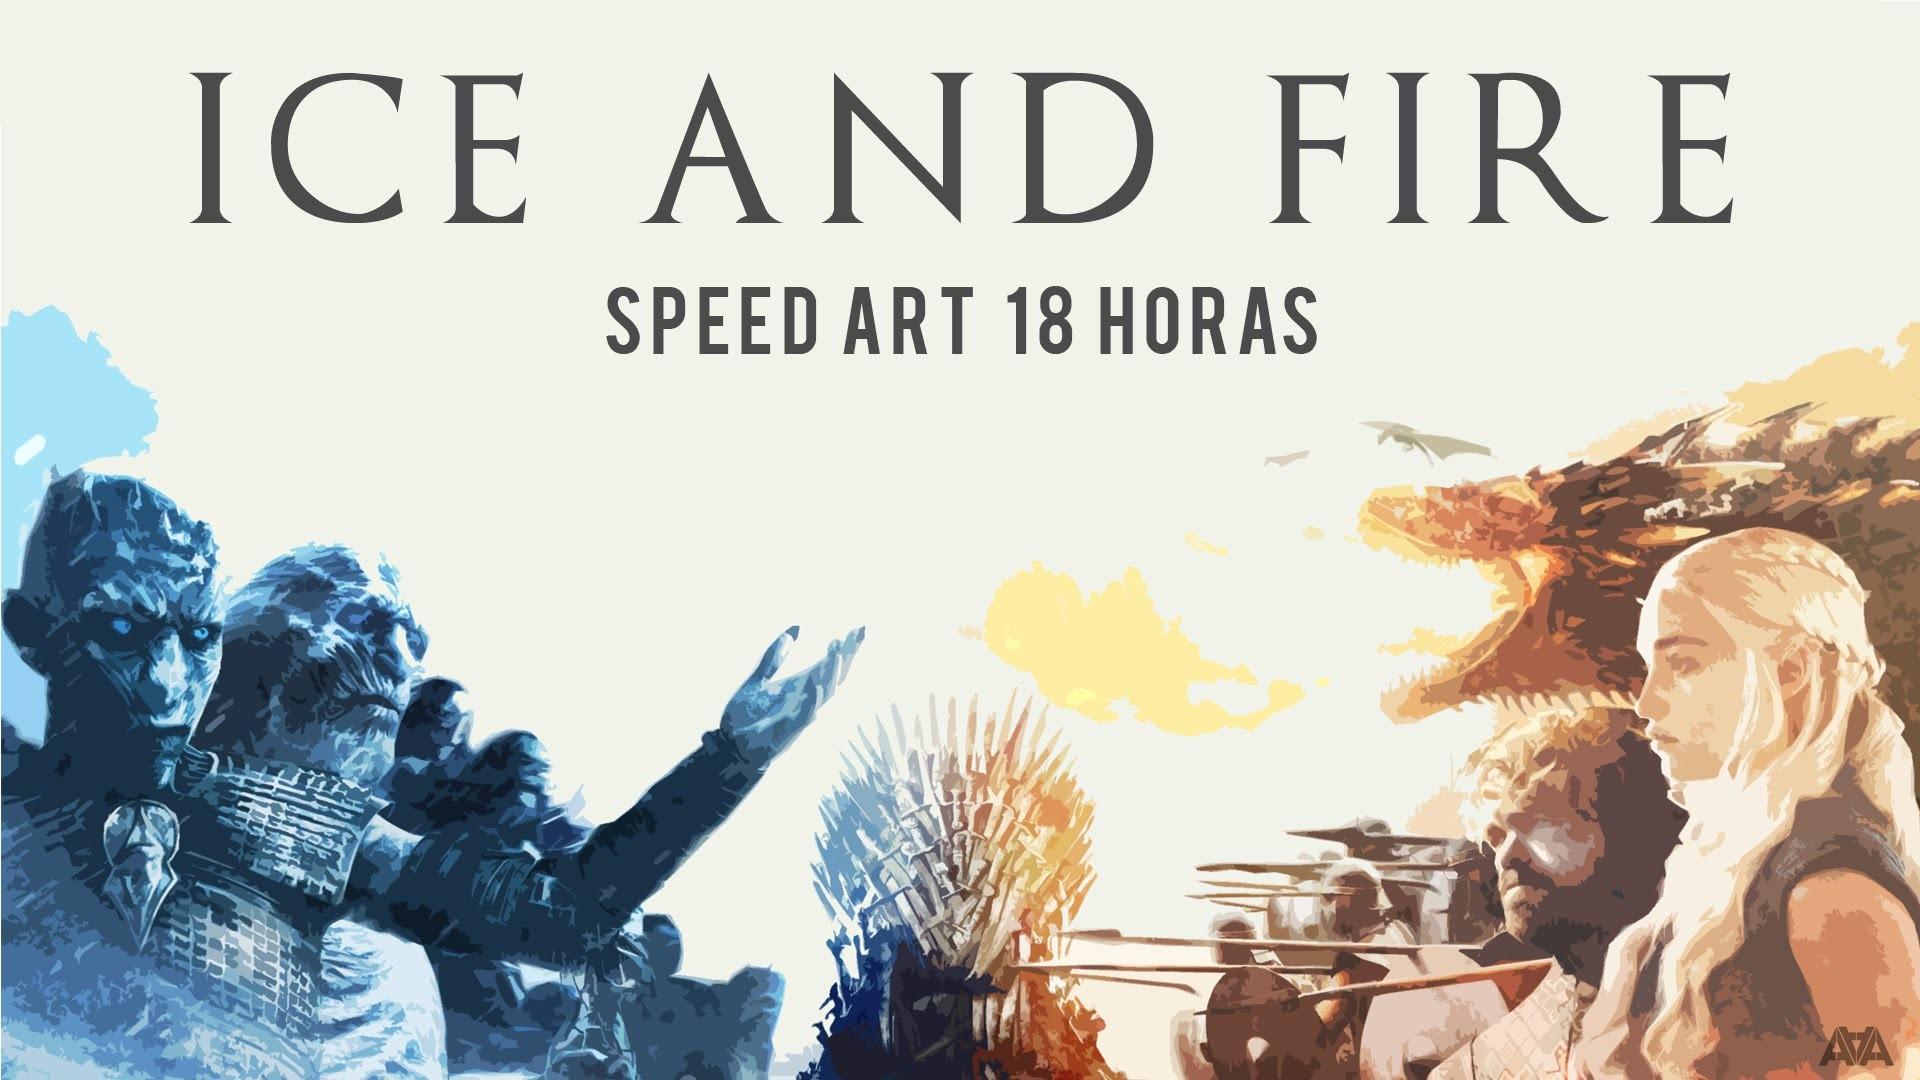 game of thrones wallpaper hd 183�� download free beautiful hd